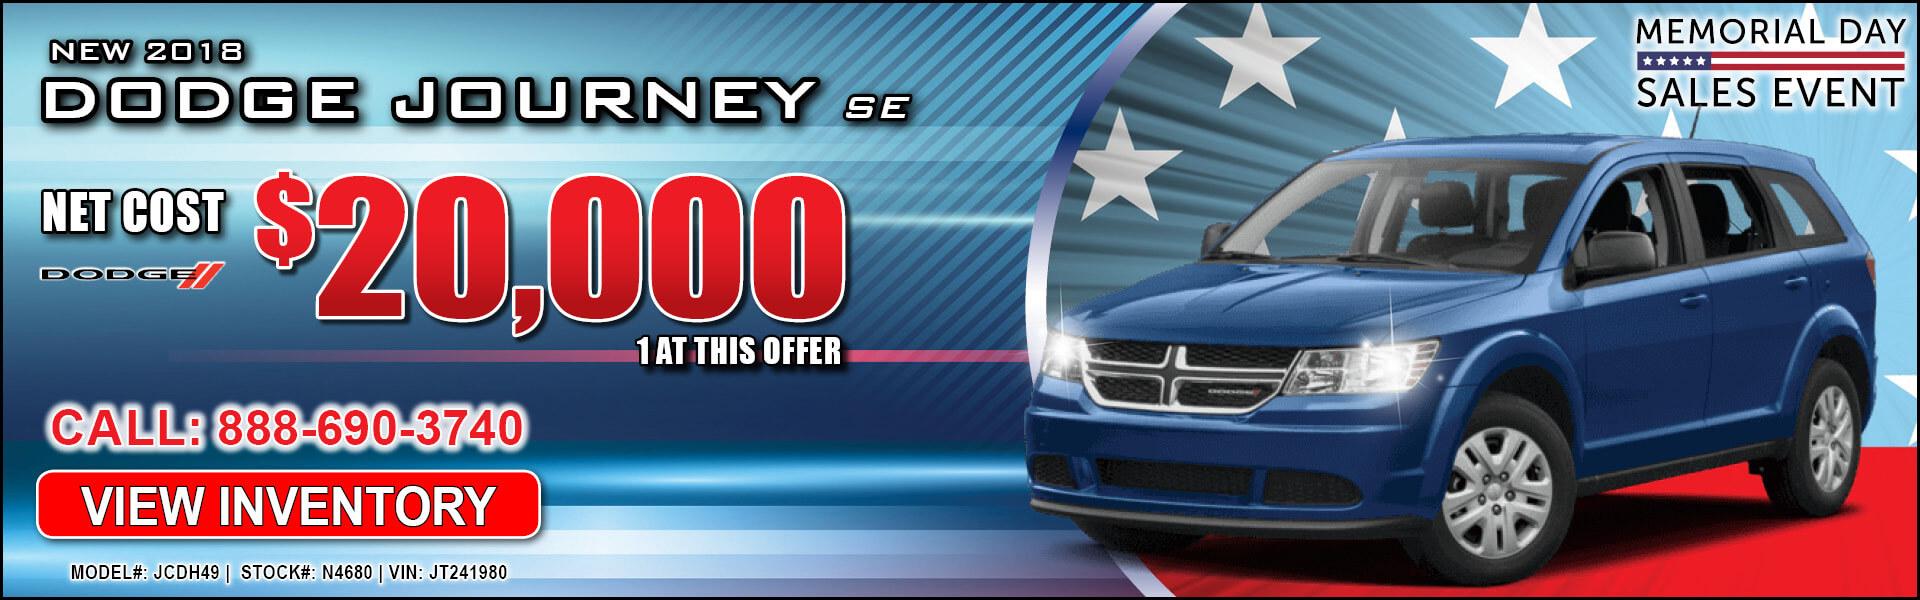 Dodge Journey $20,000